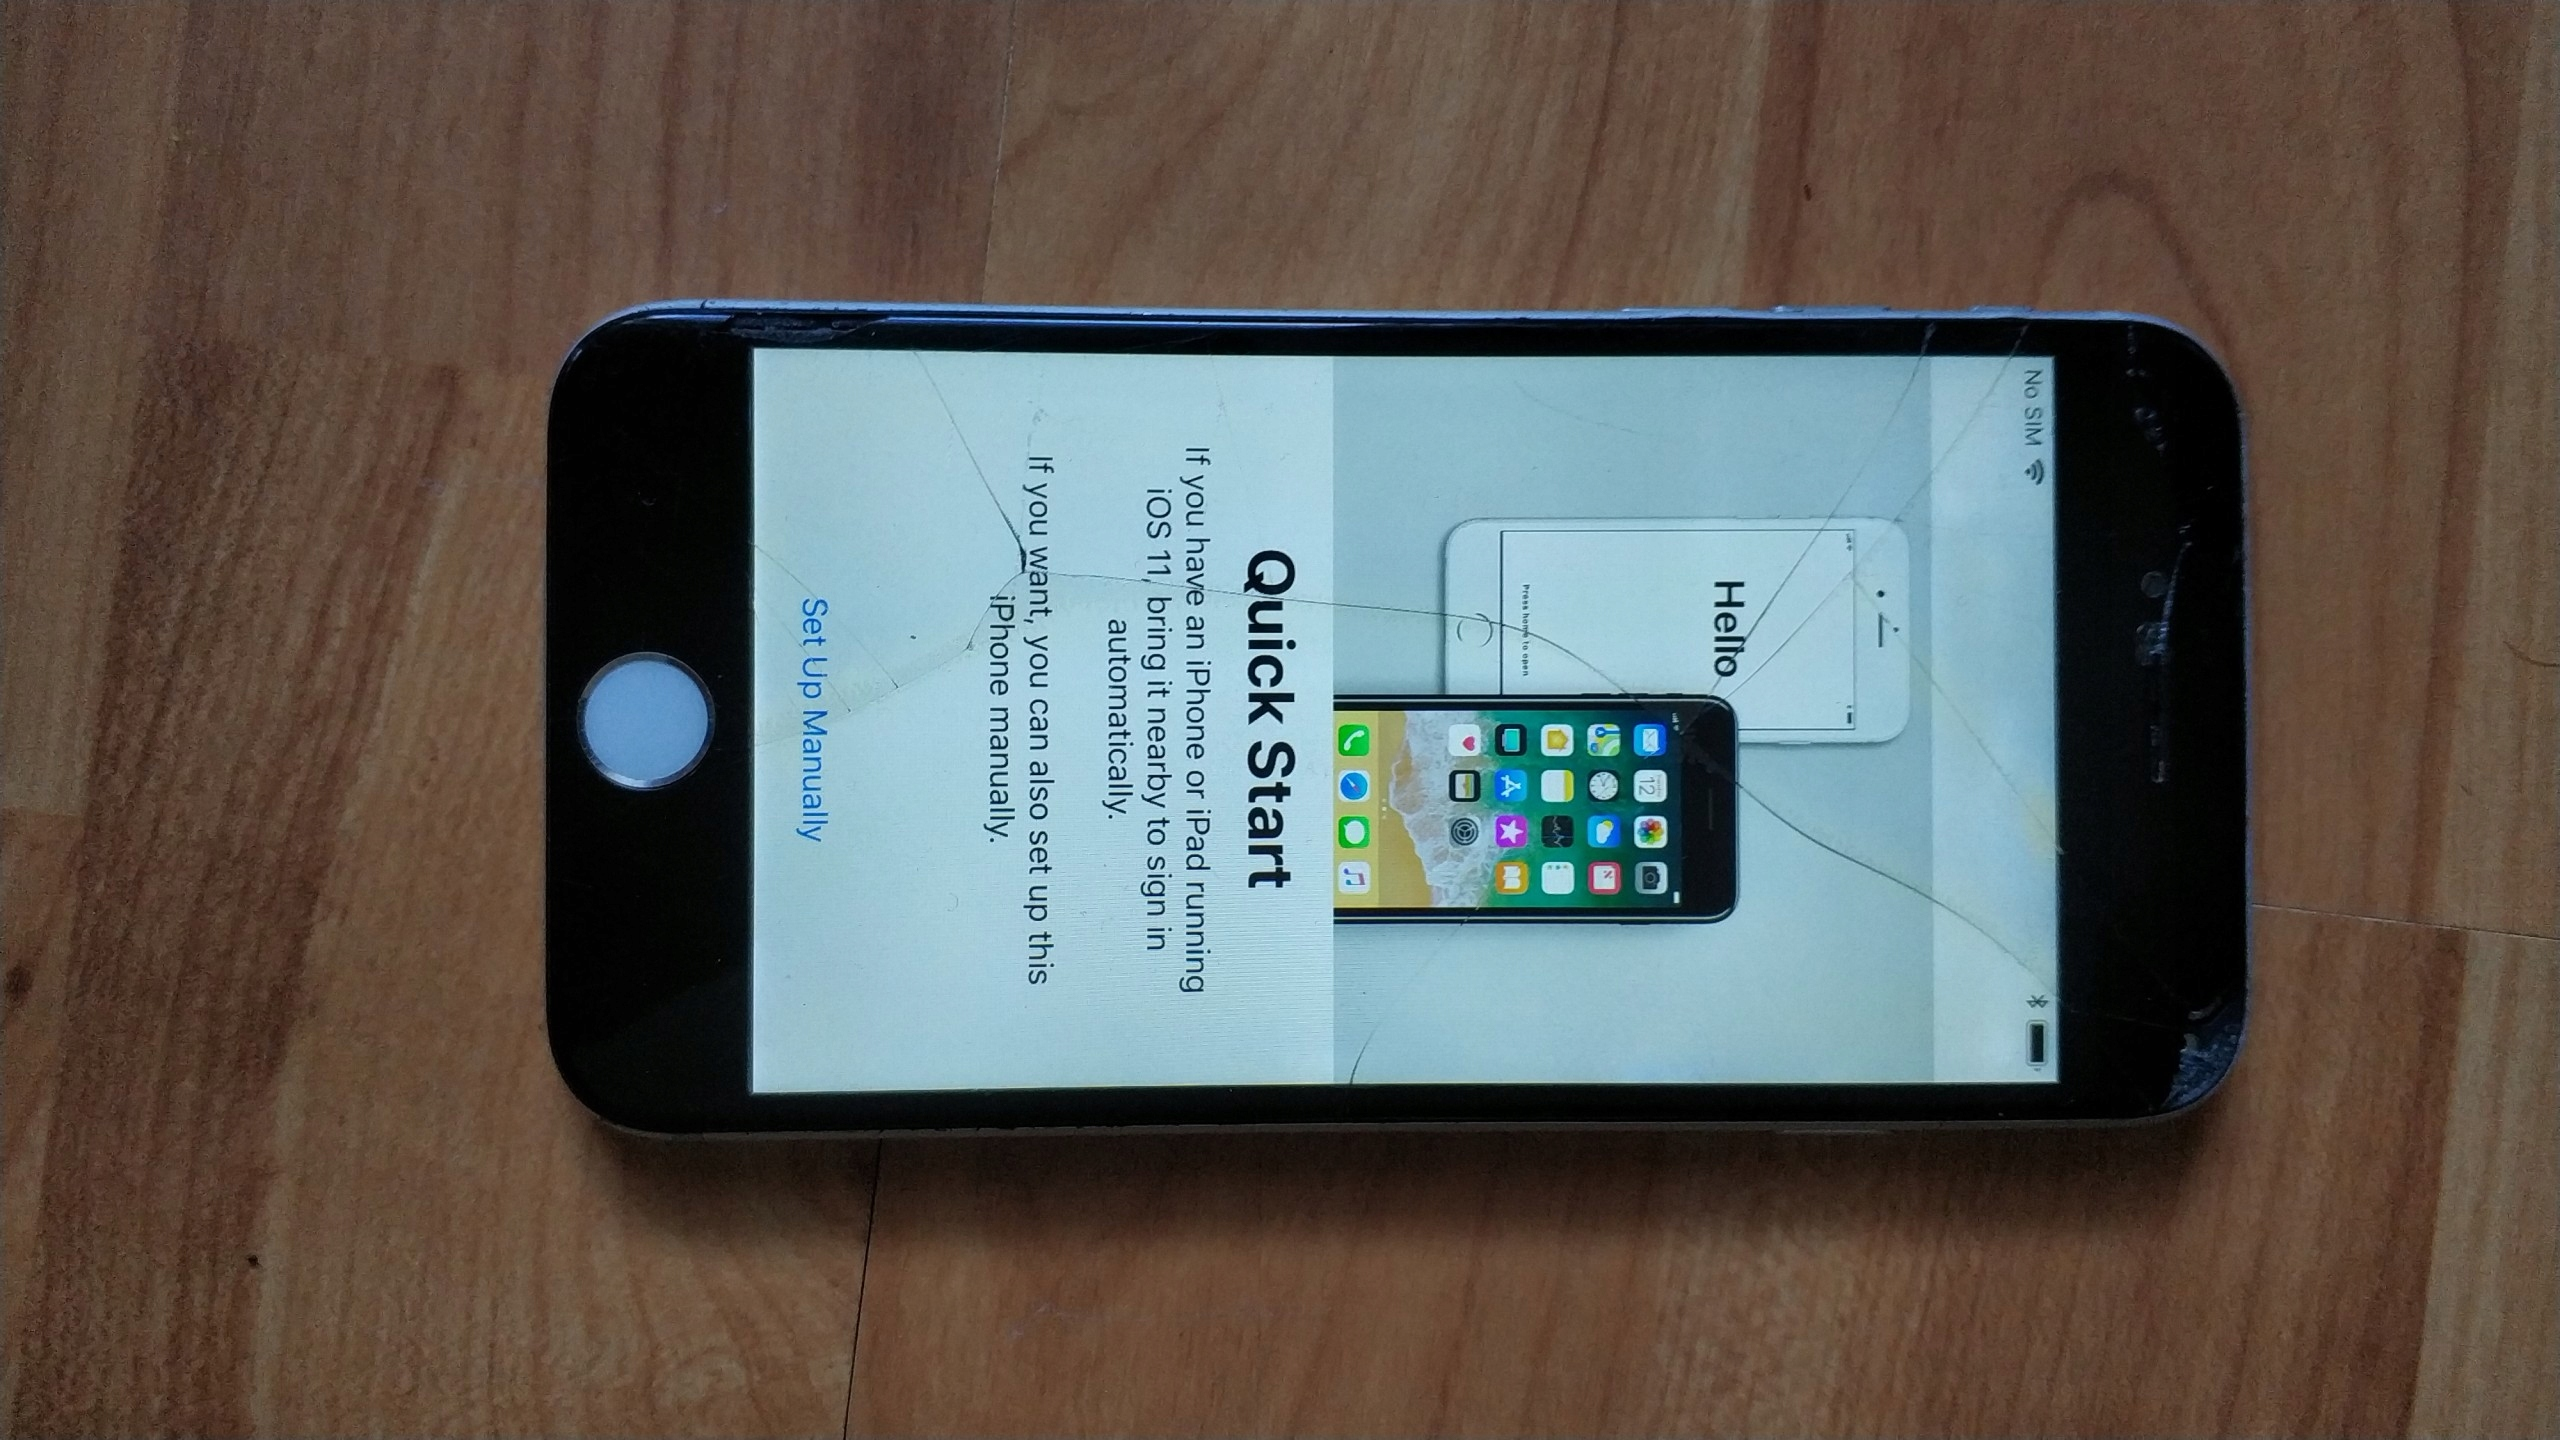 Iphone 6 16gb A1586 Blokada Icloud